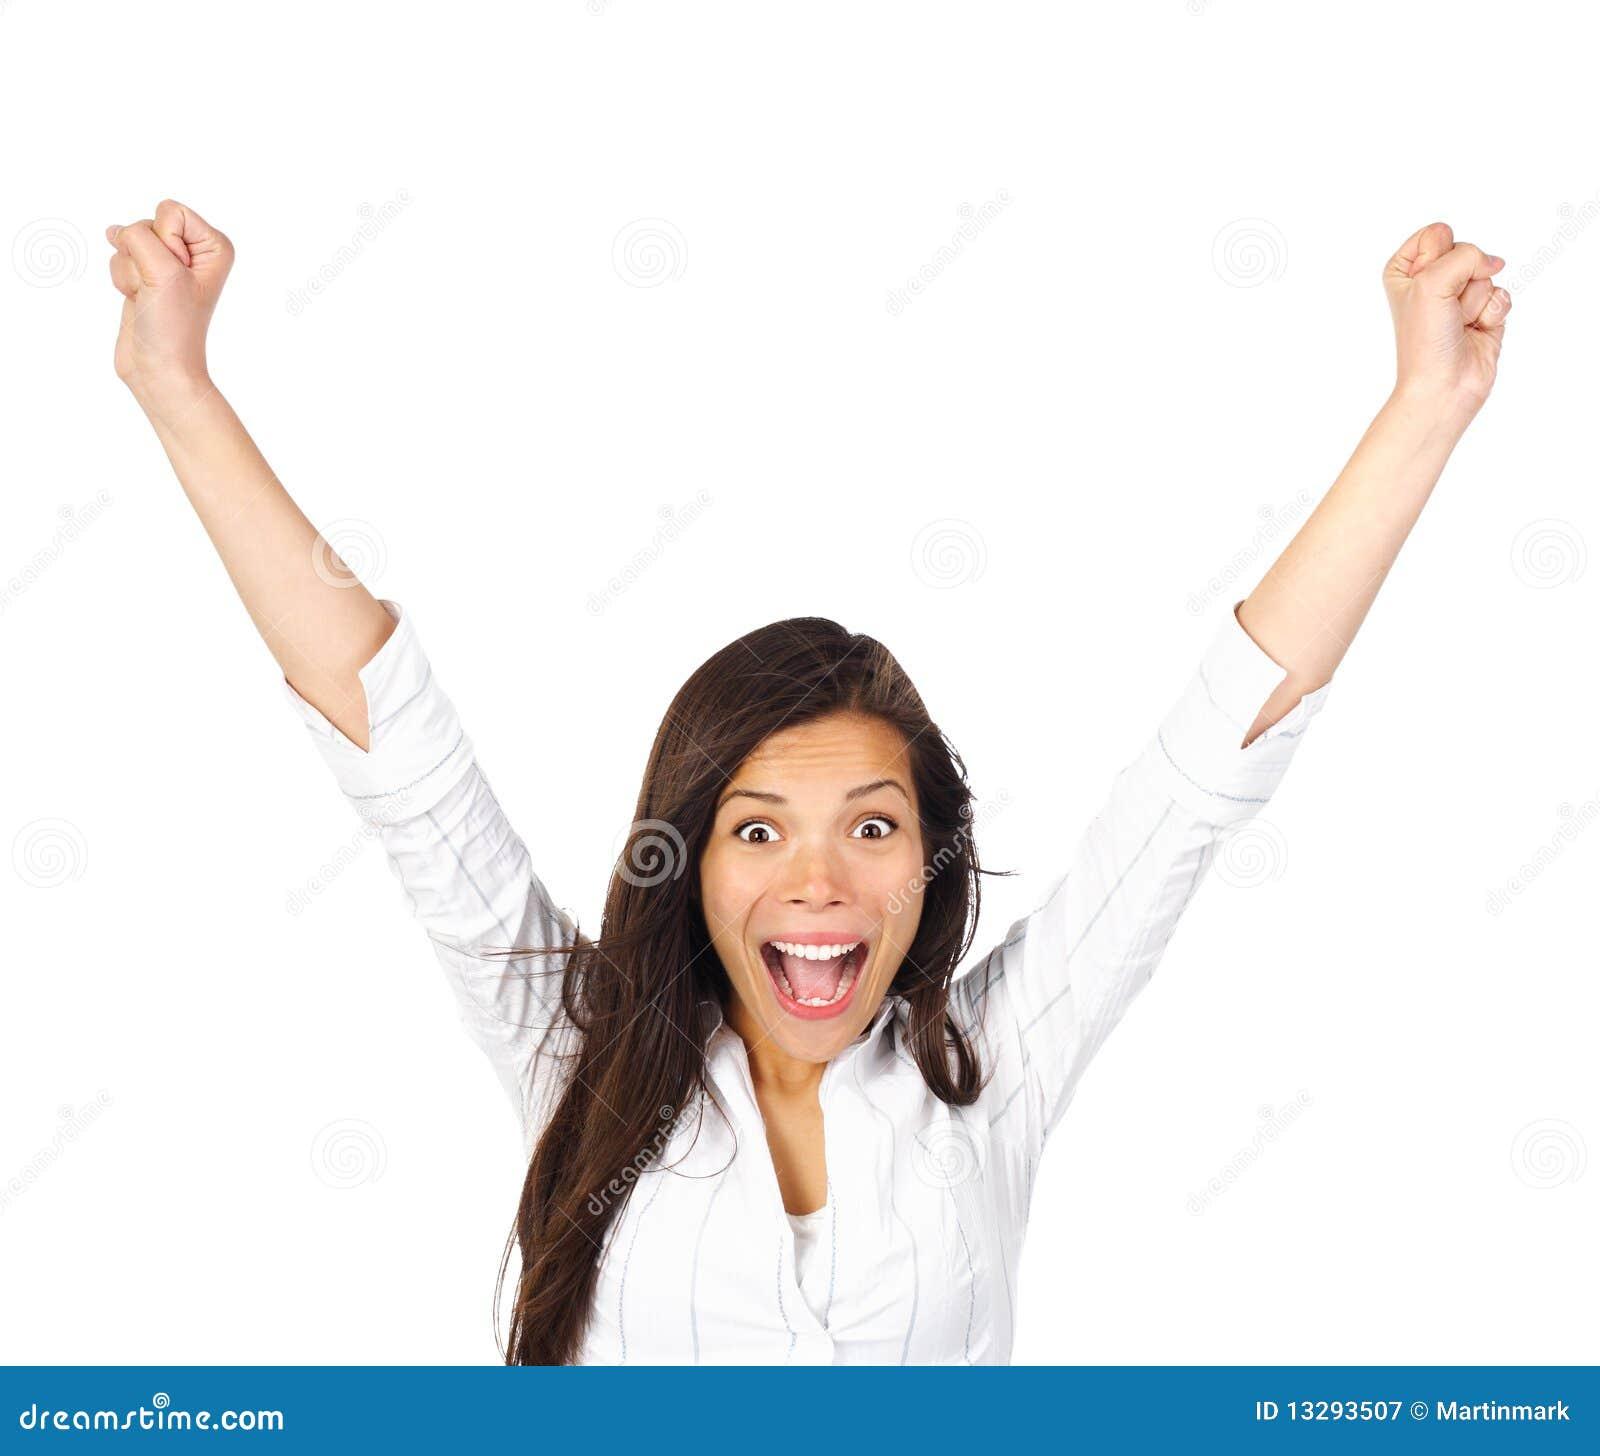 ... Winner Winning Woman Royalty Free Stock Photography - Image: 13293507